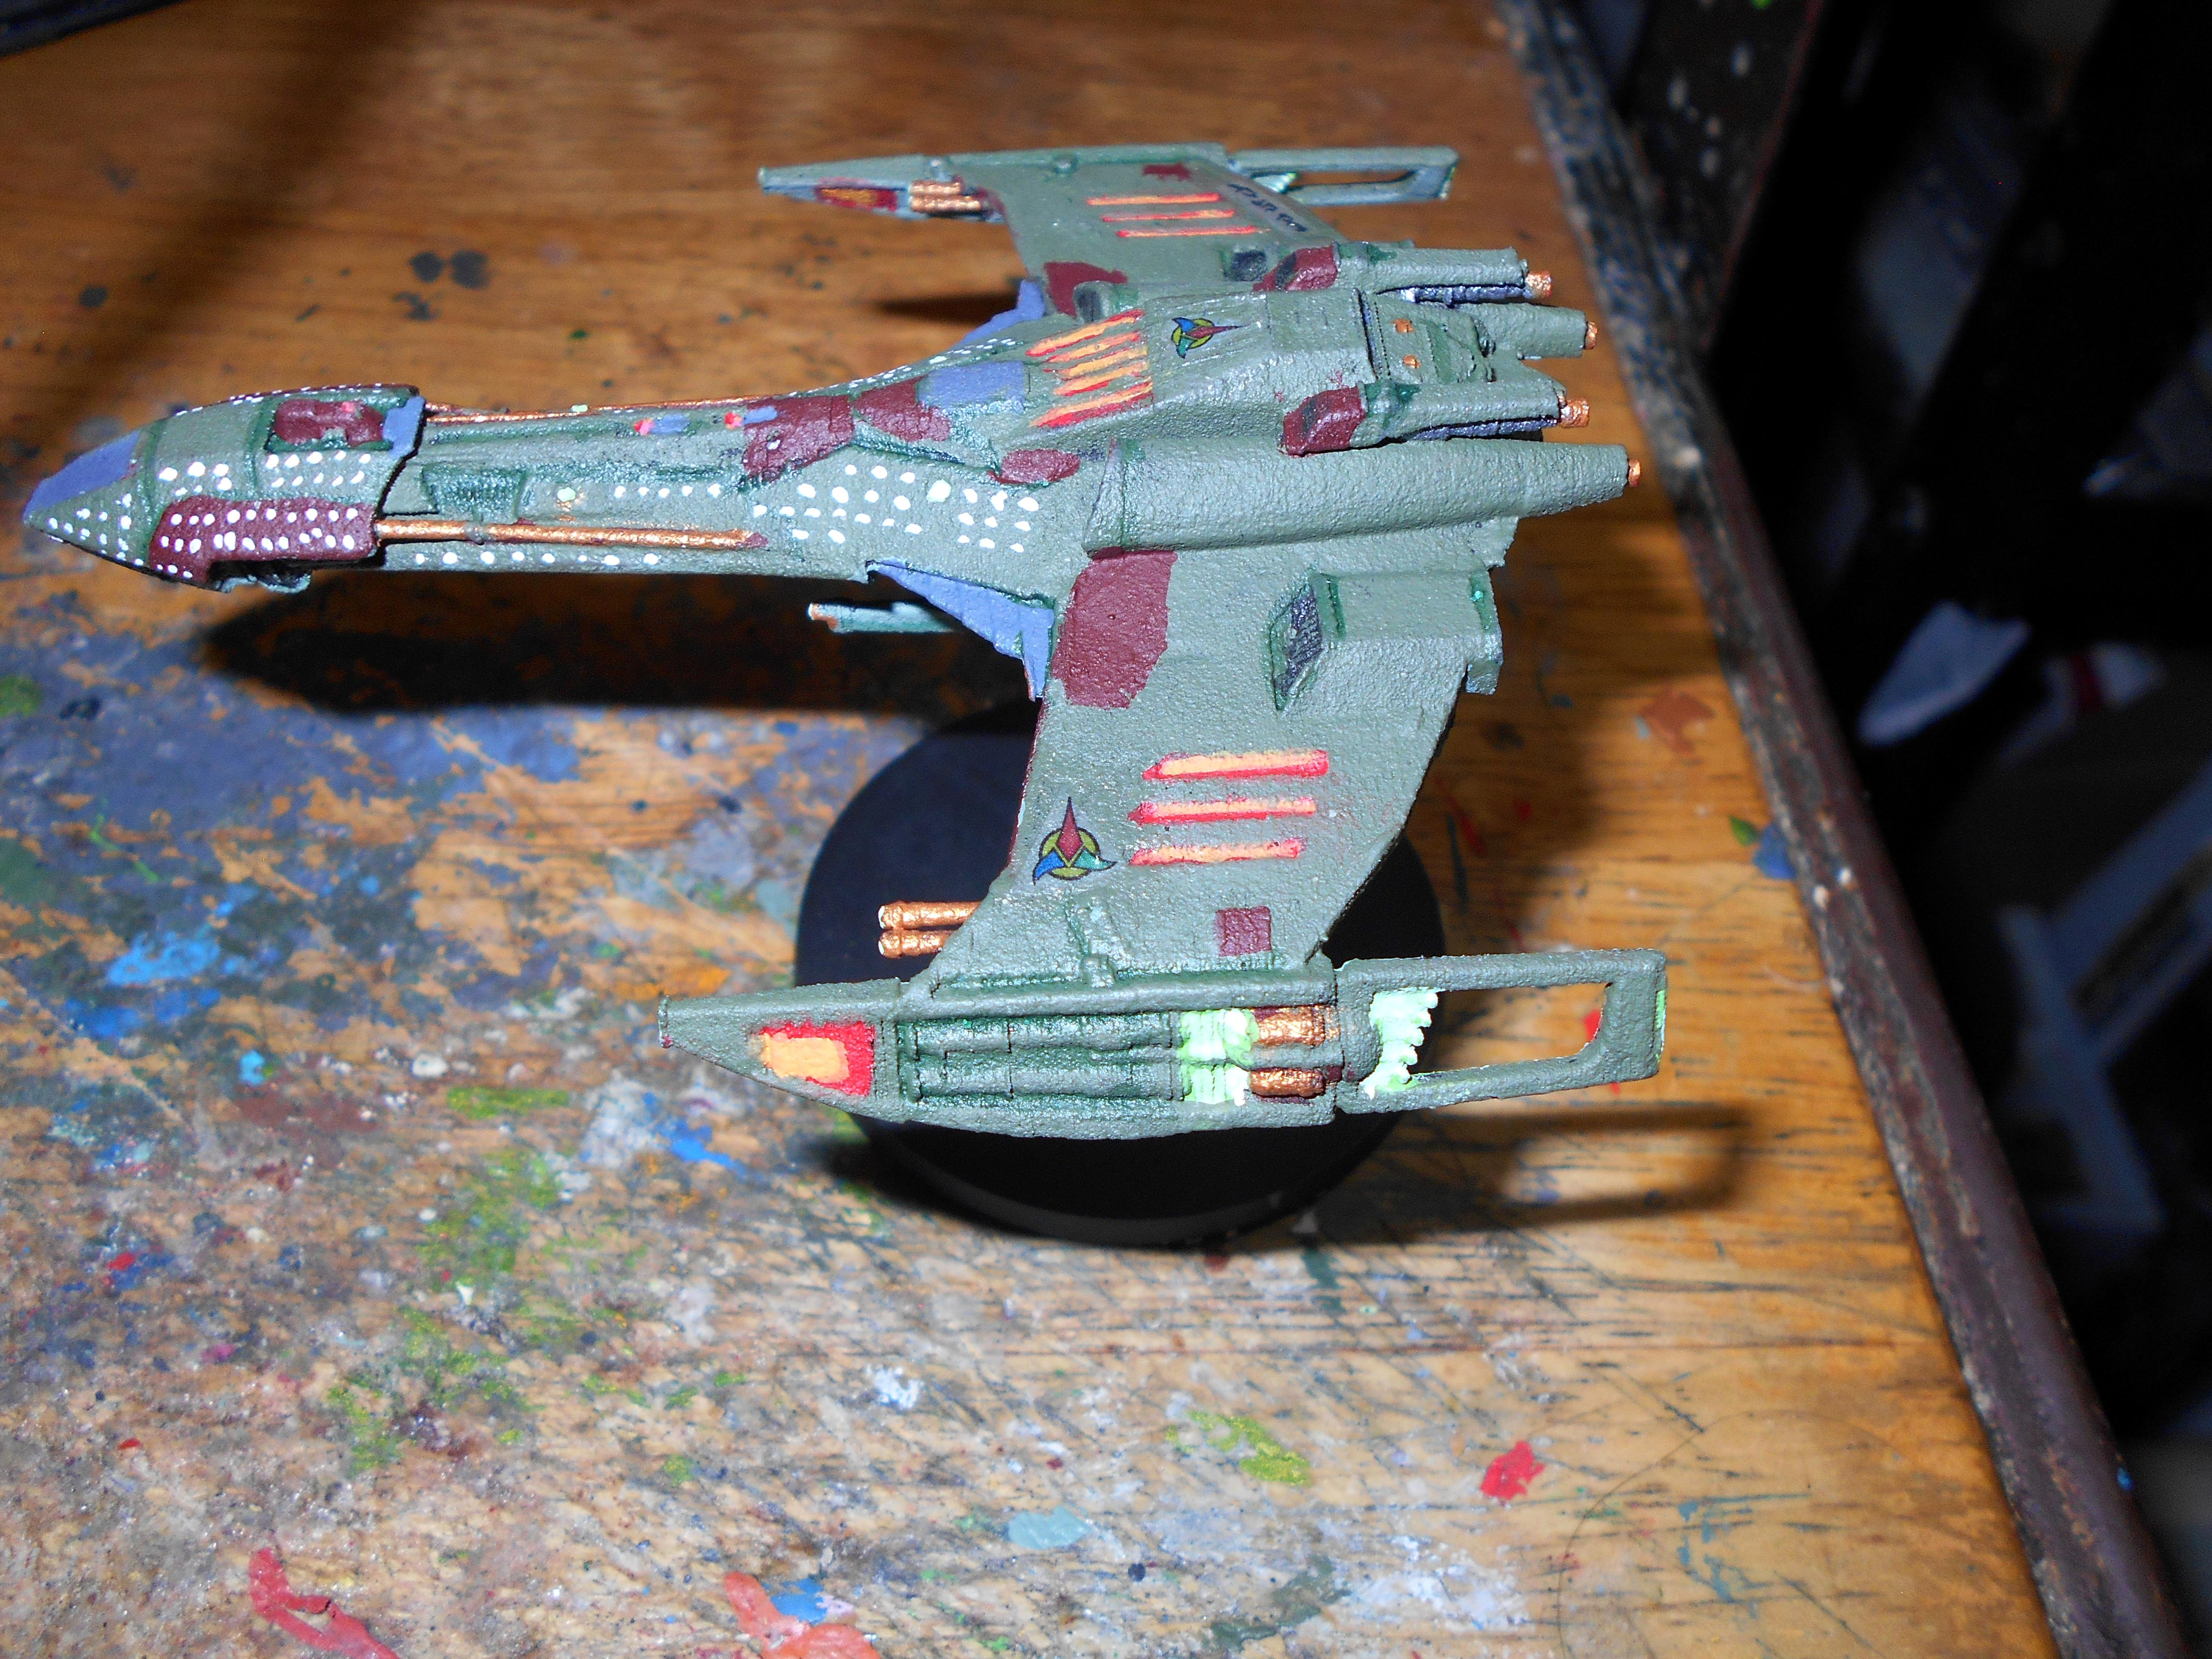 Klingon, Space Ship, Star Trek